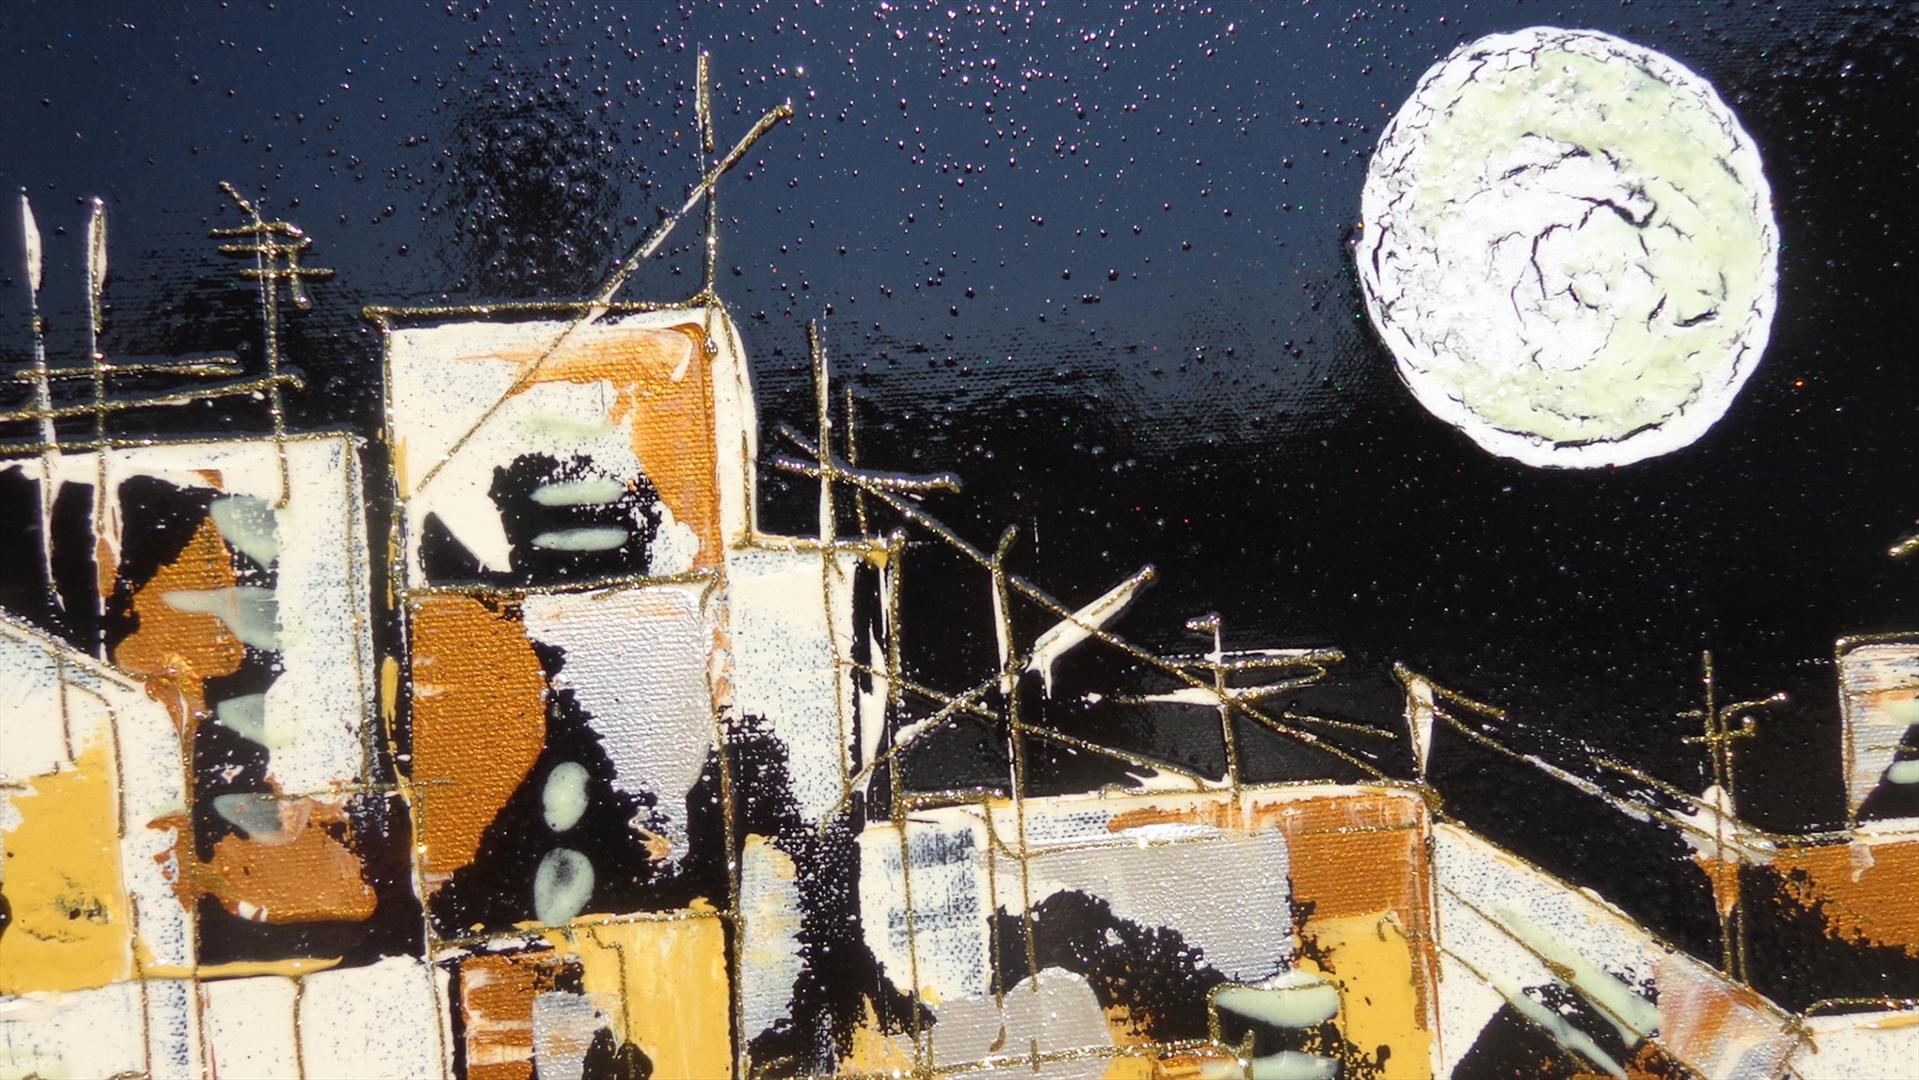 Paesaggio urbano con luna   Vendita Quadri Online   Quadri moderni ...